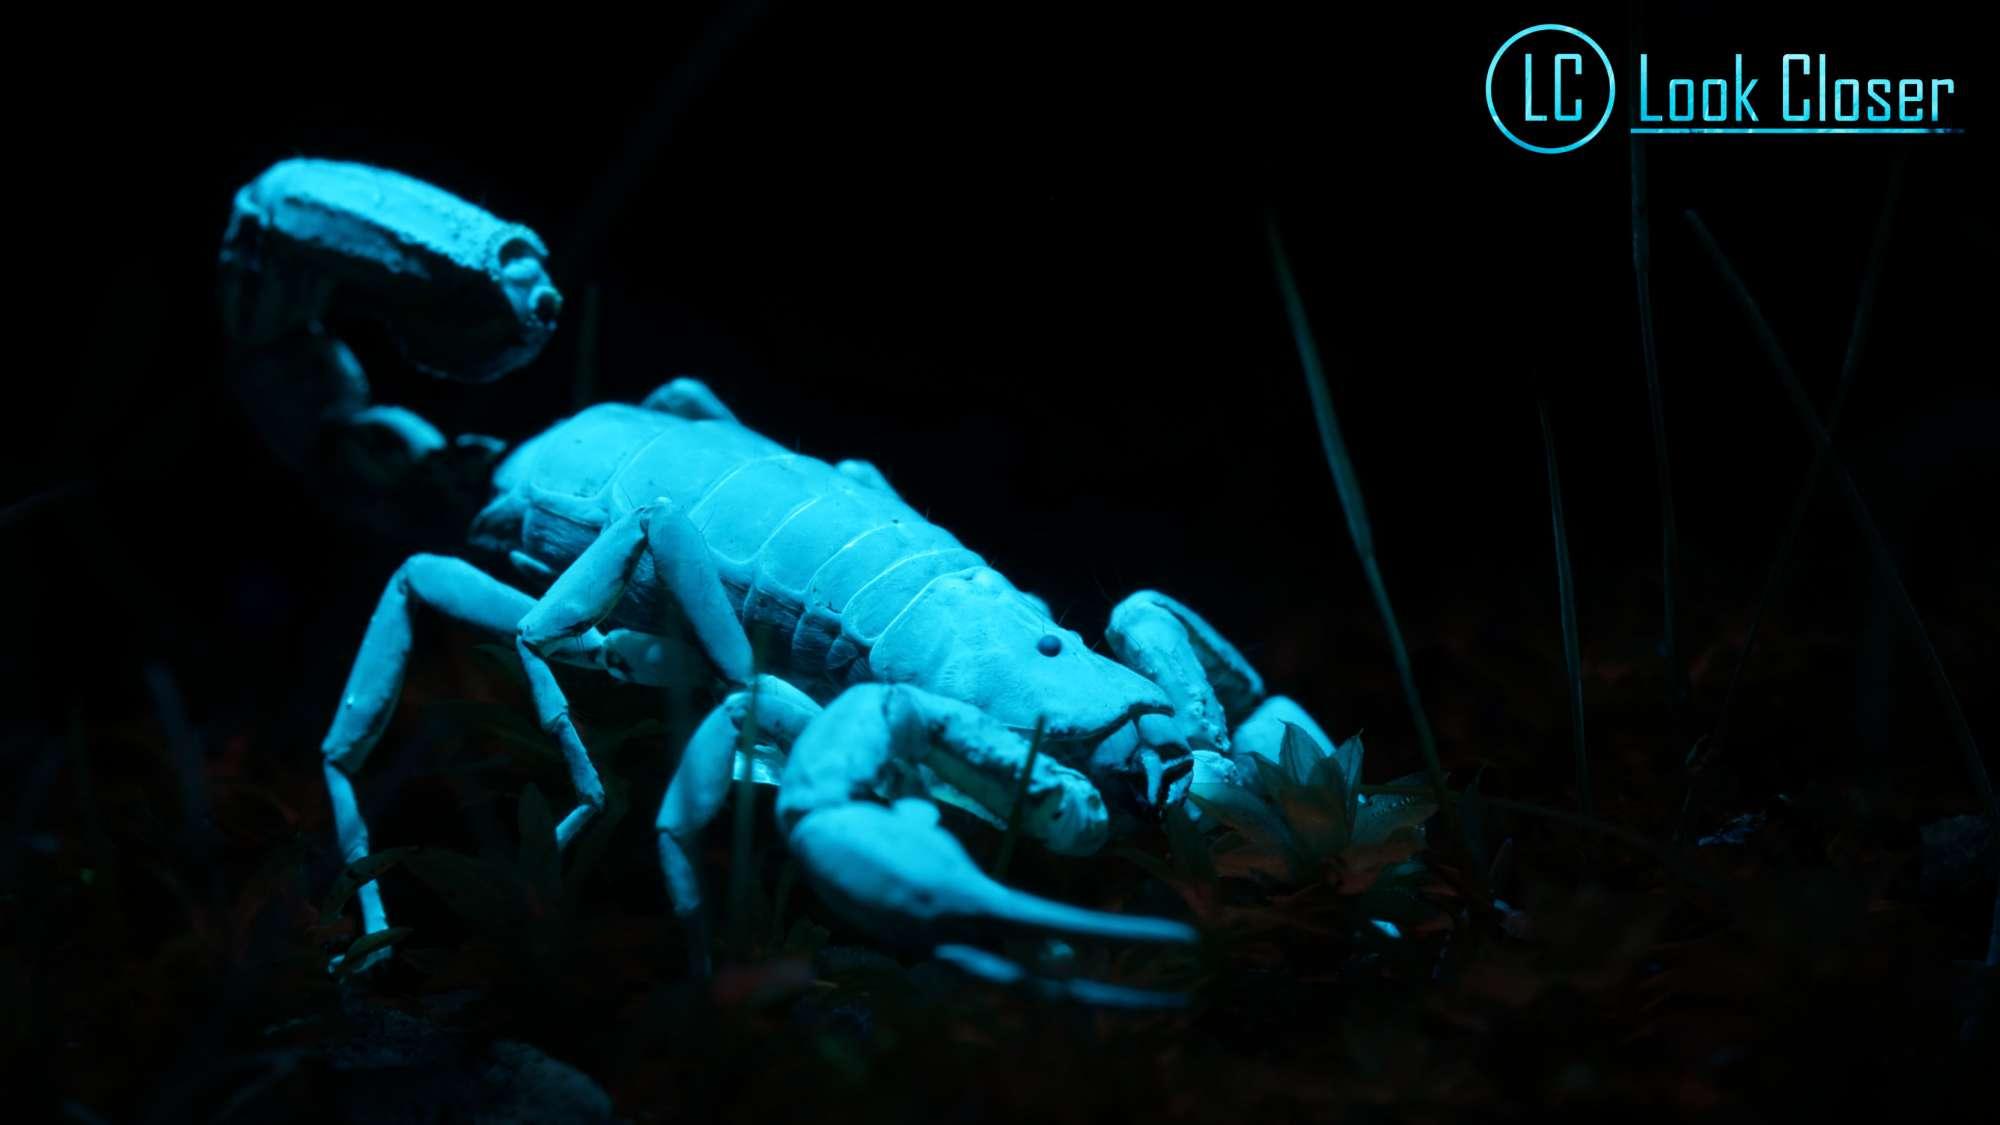 Scorpion photographed with UV light